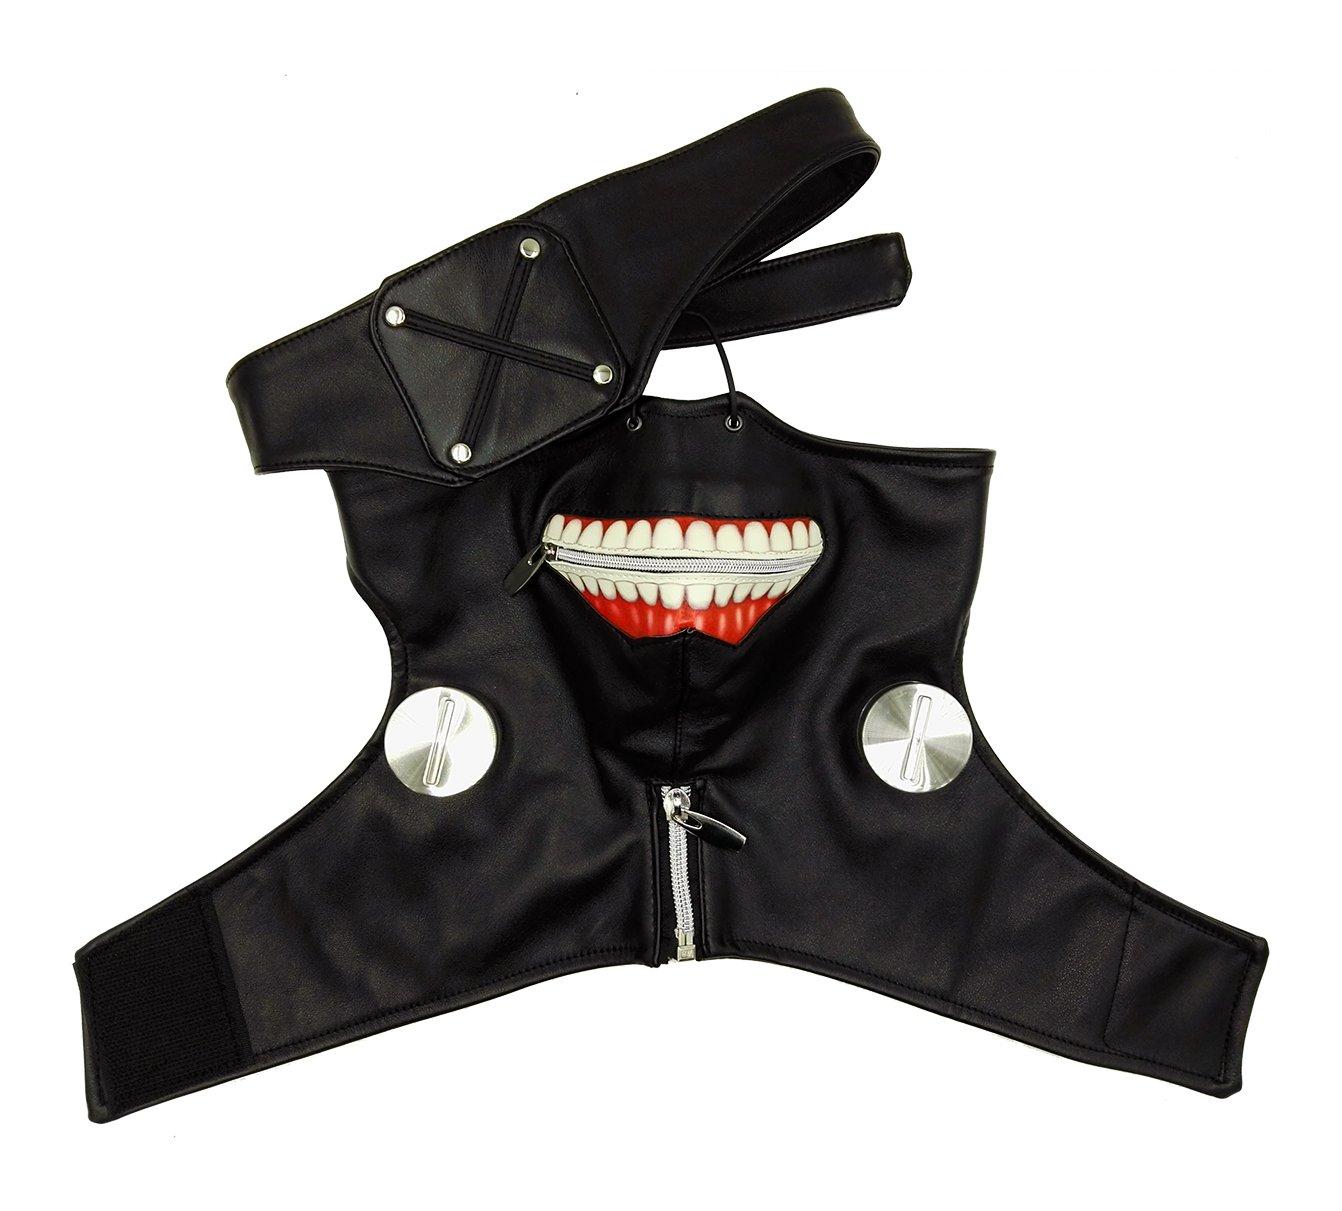 ANOTHERME Sale Tokyo Ghoul Ken Kaneki Season 1 Black Zipper Mask Party Cosplay Accessories Prop